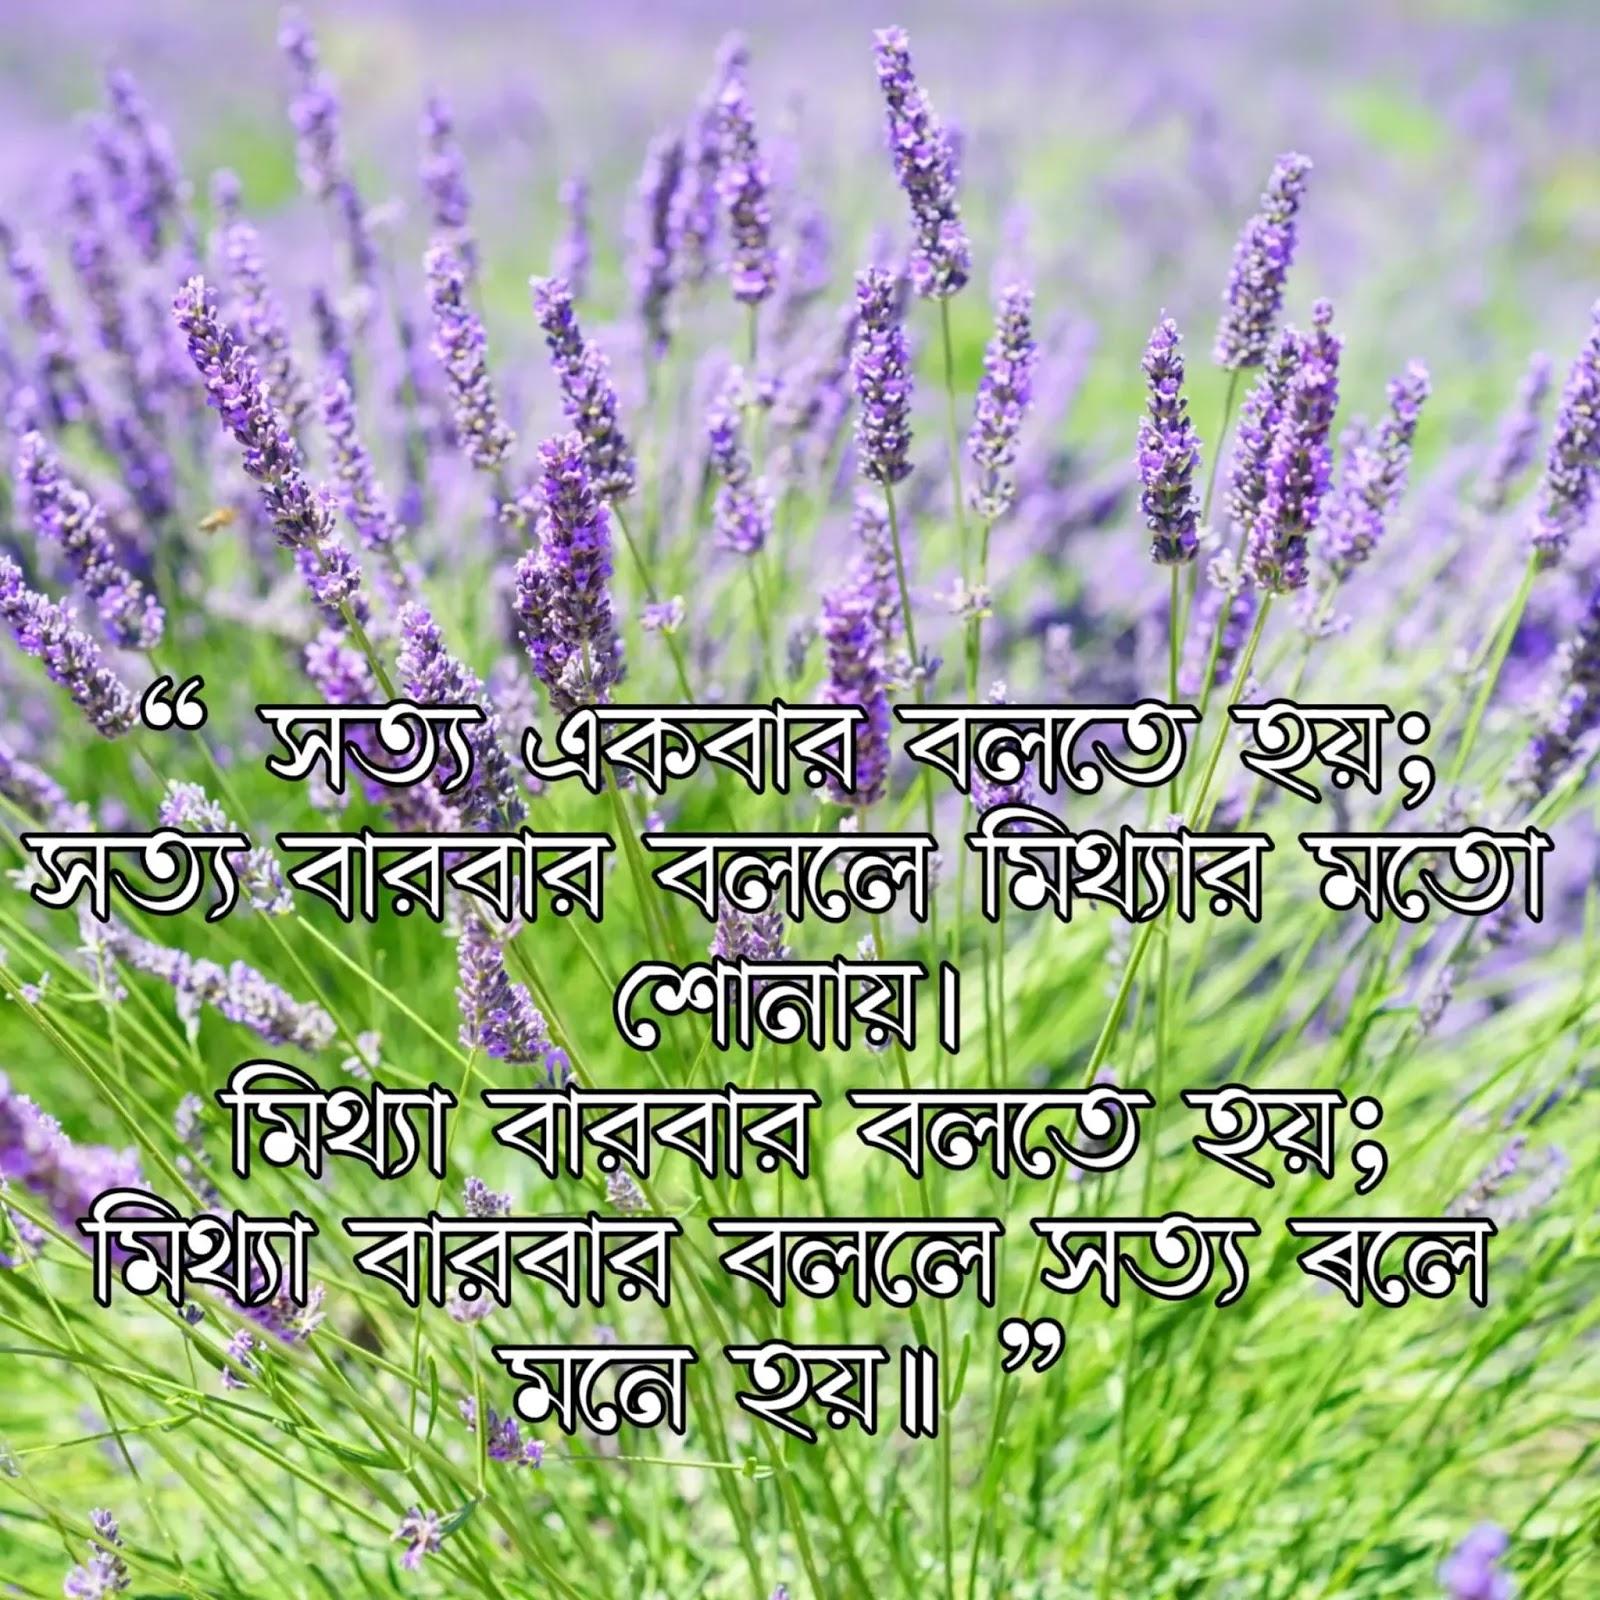 positive Bengali quotes